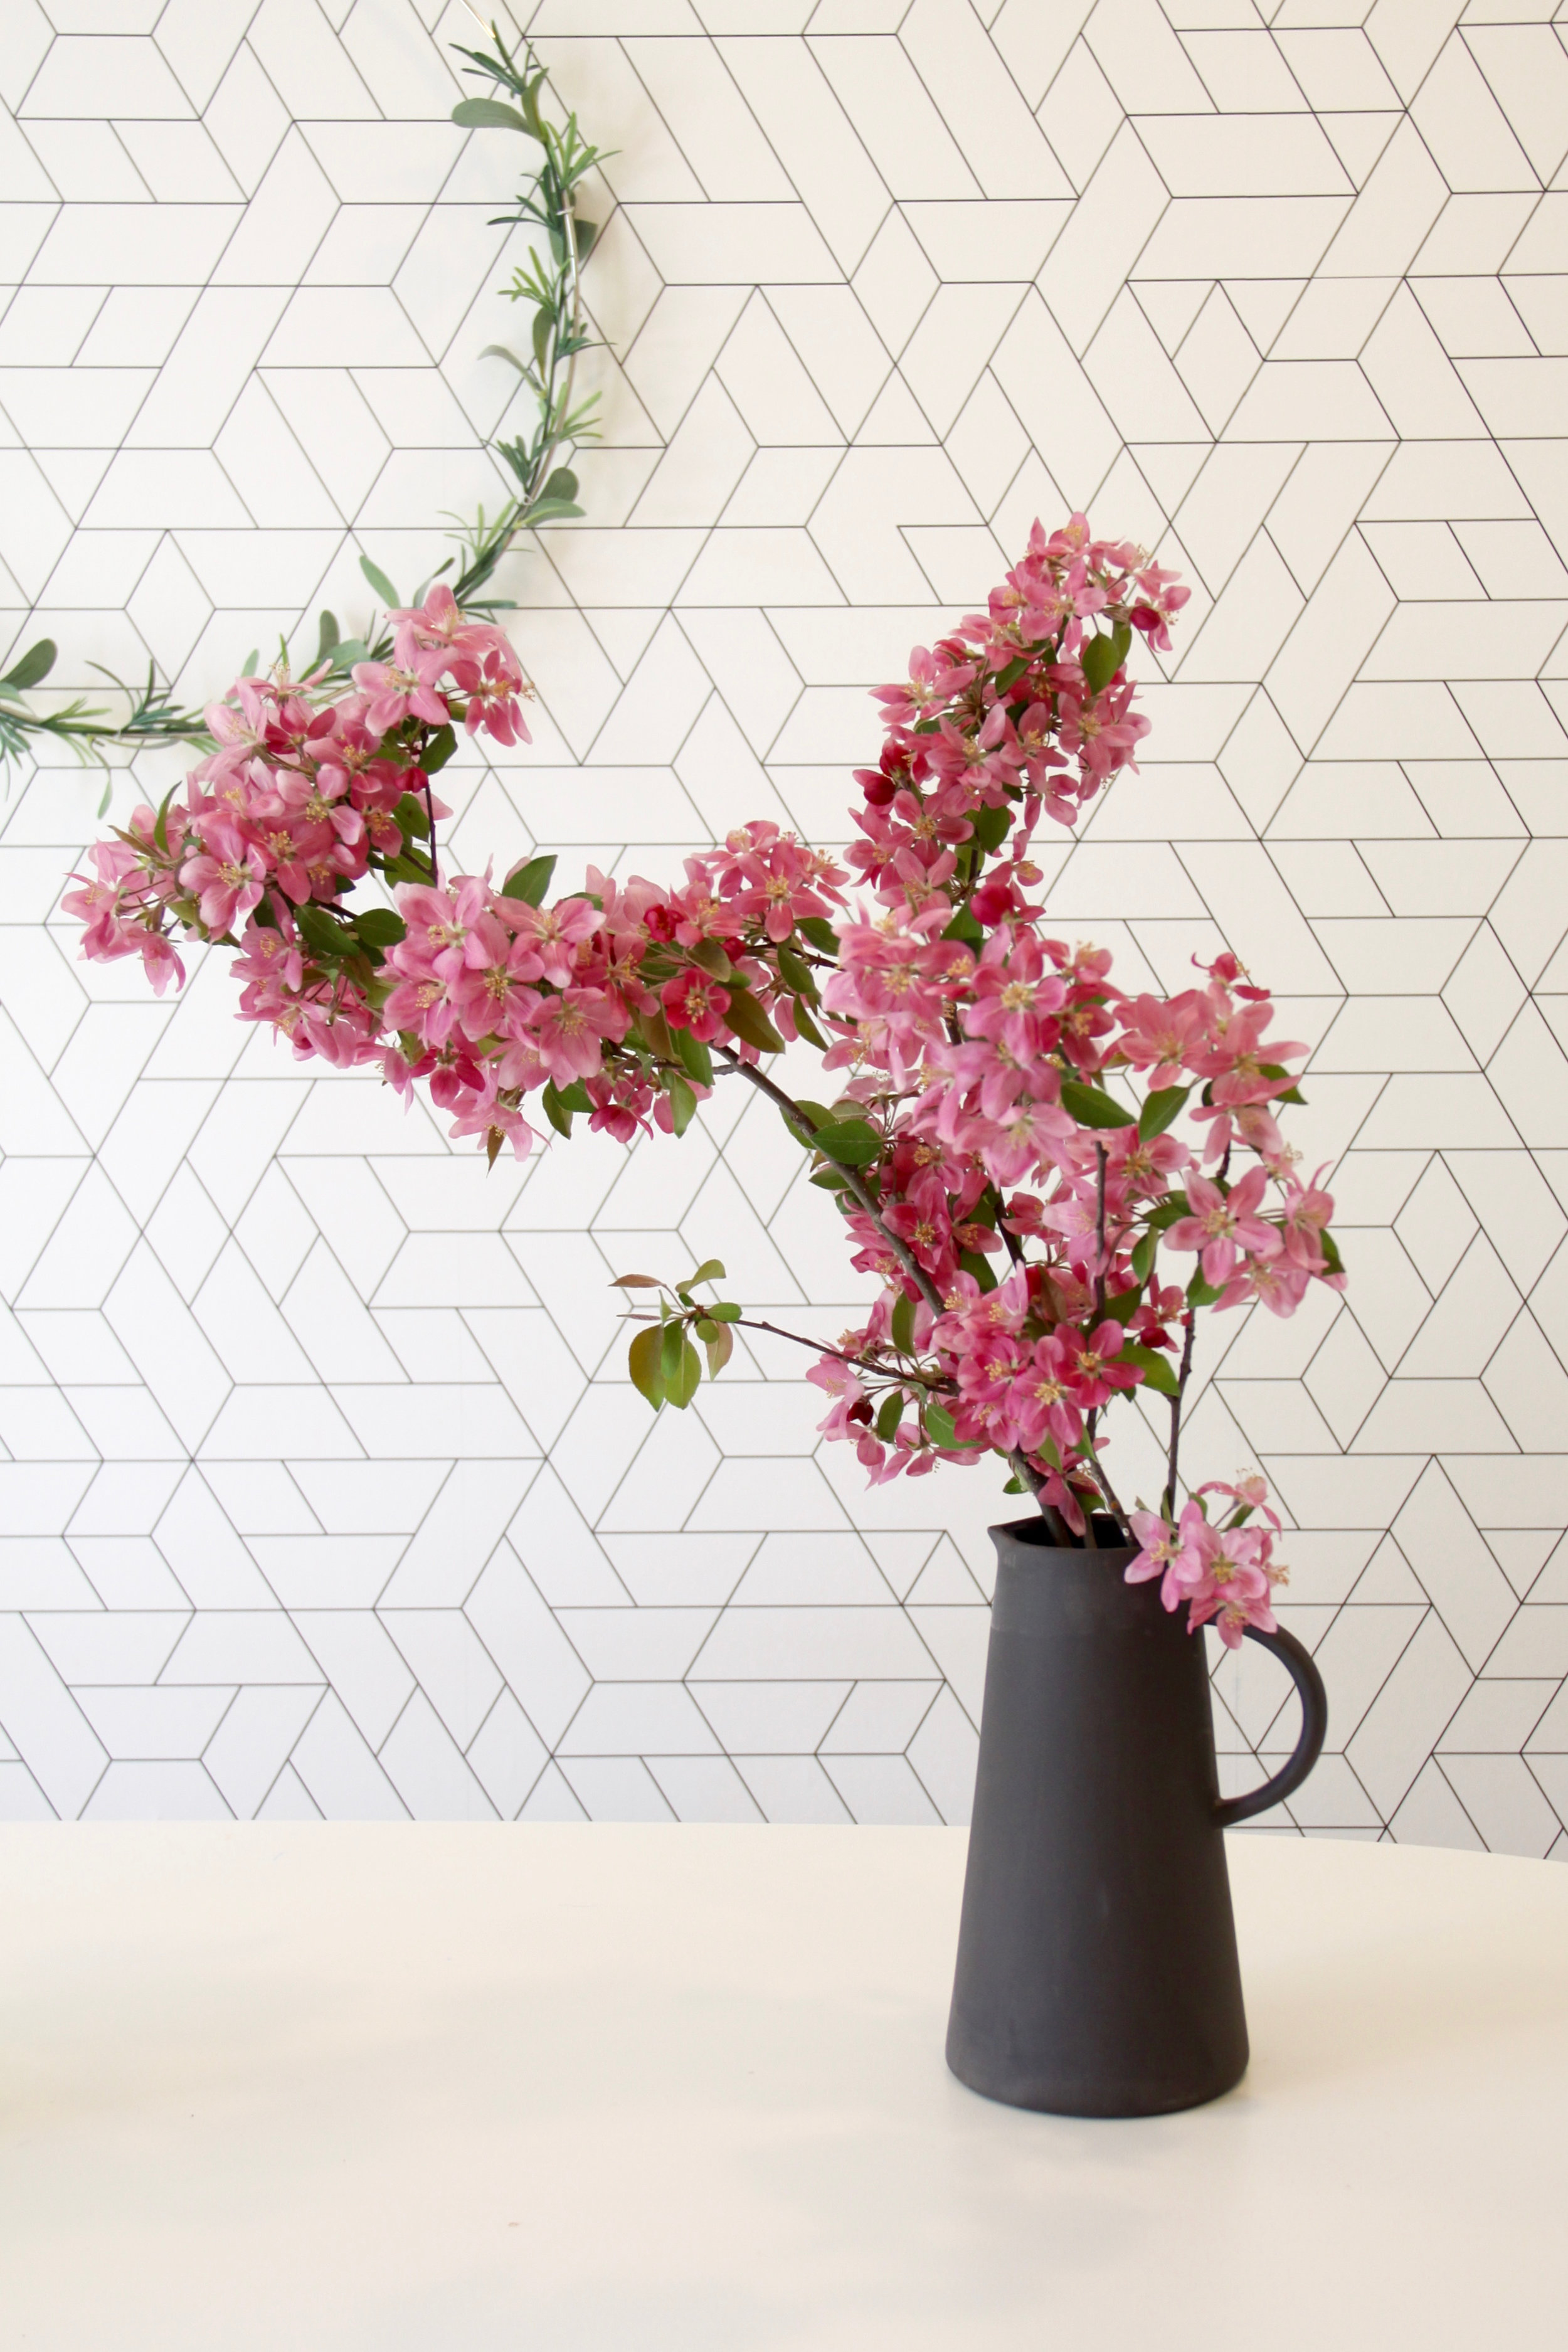 Flowering Branches in Black Matte Vase